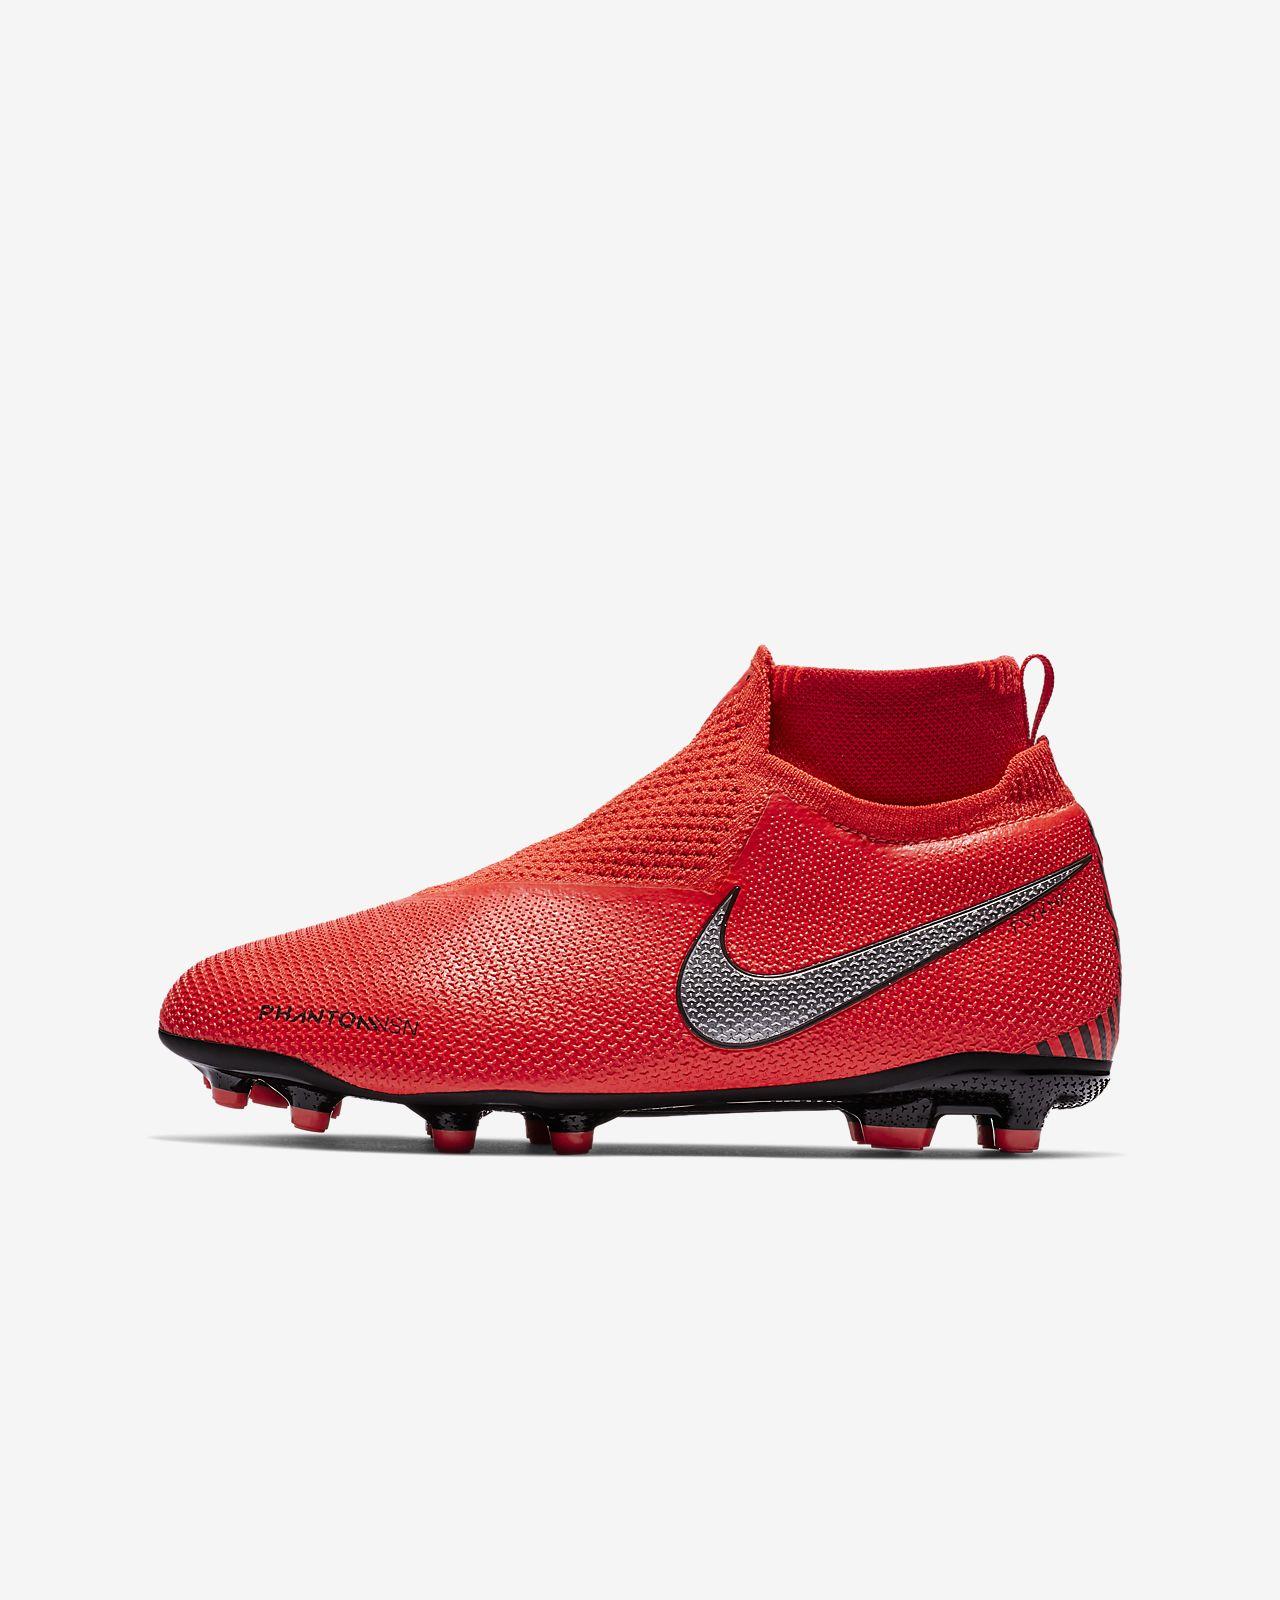 Calzado de fútbol para múltiples superficies para niños talla grande Nike  Jr. PhantomVSN Elite Dynamic a46f7c14183